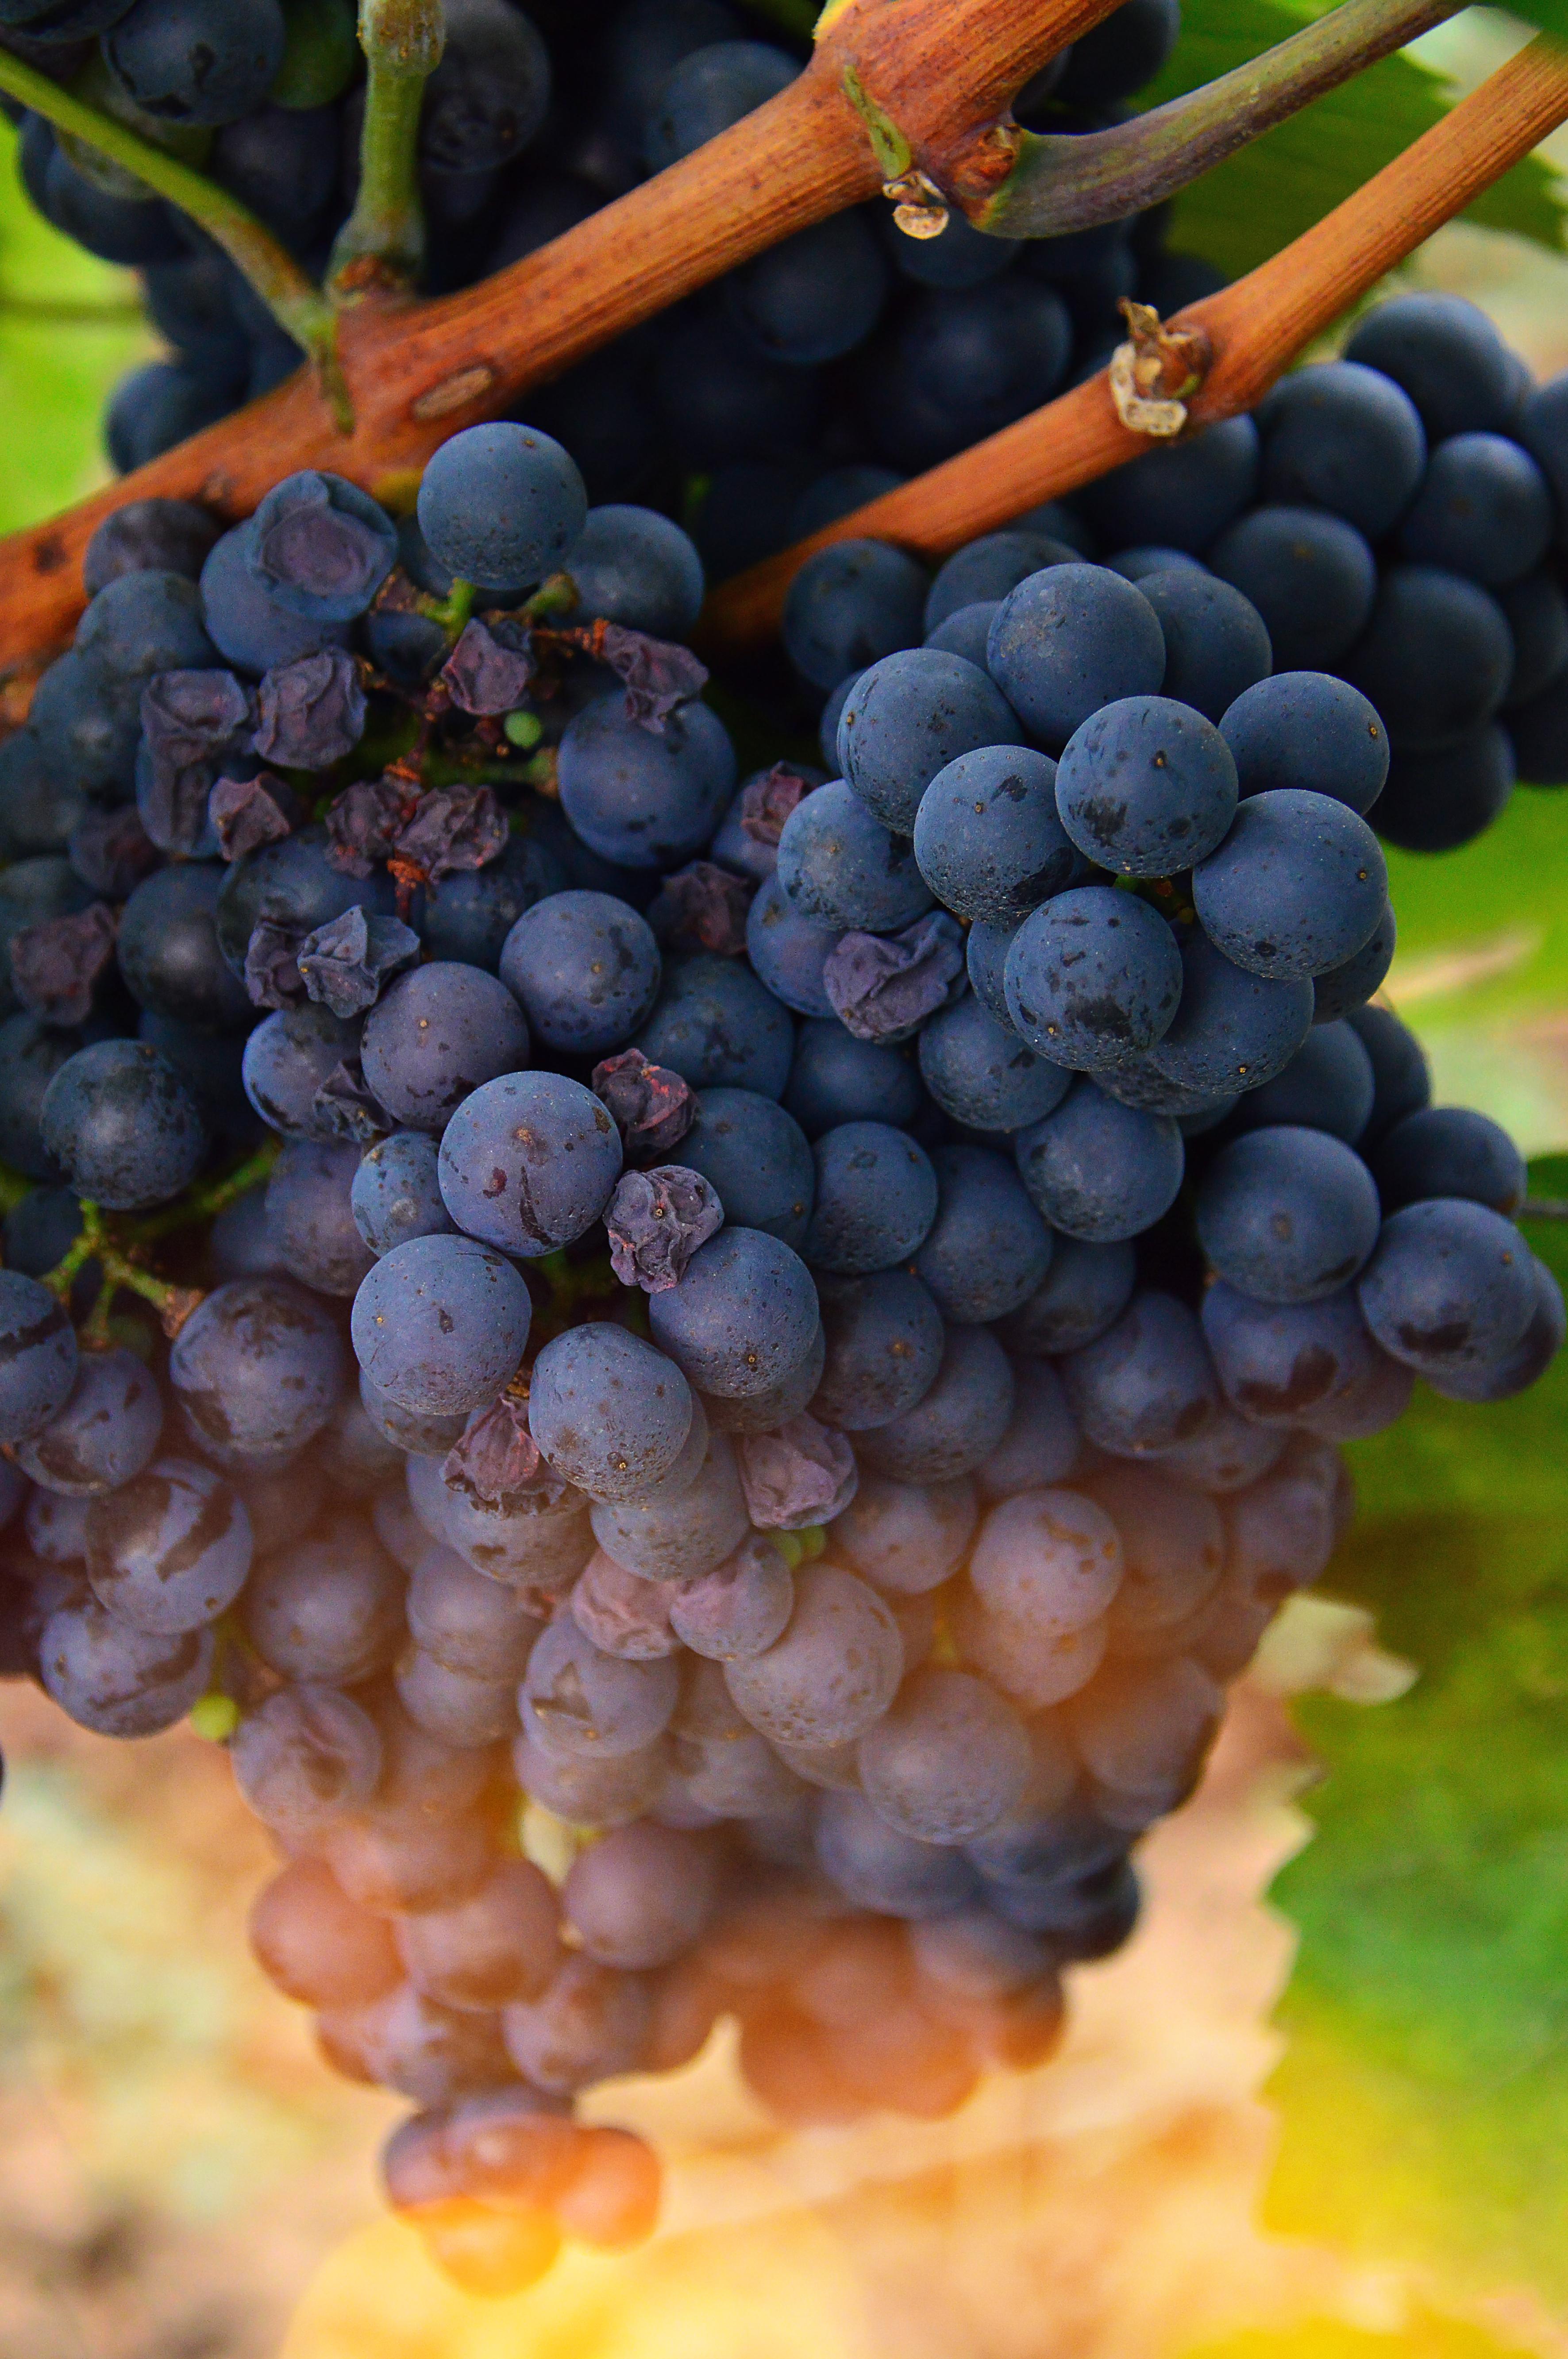 93 Gambar Anggur Segar Paling Hist